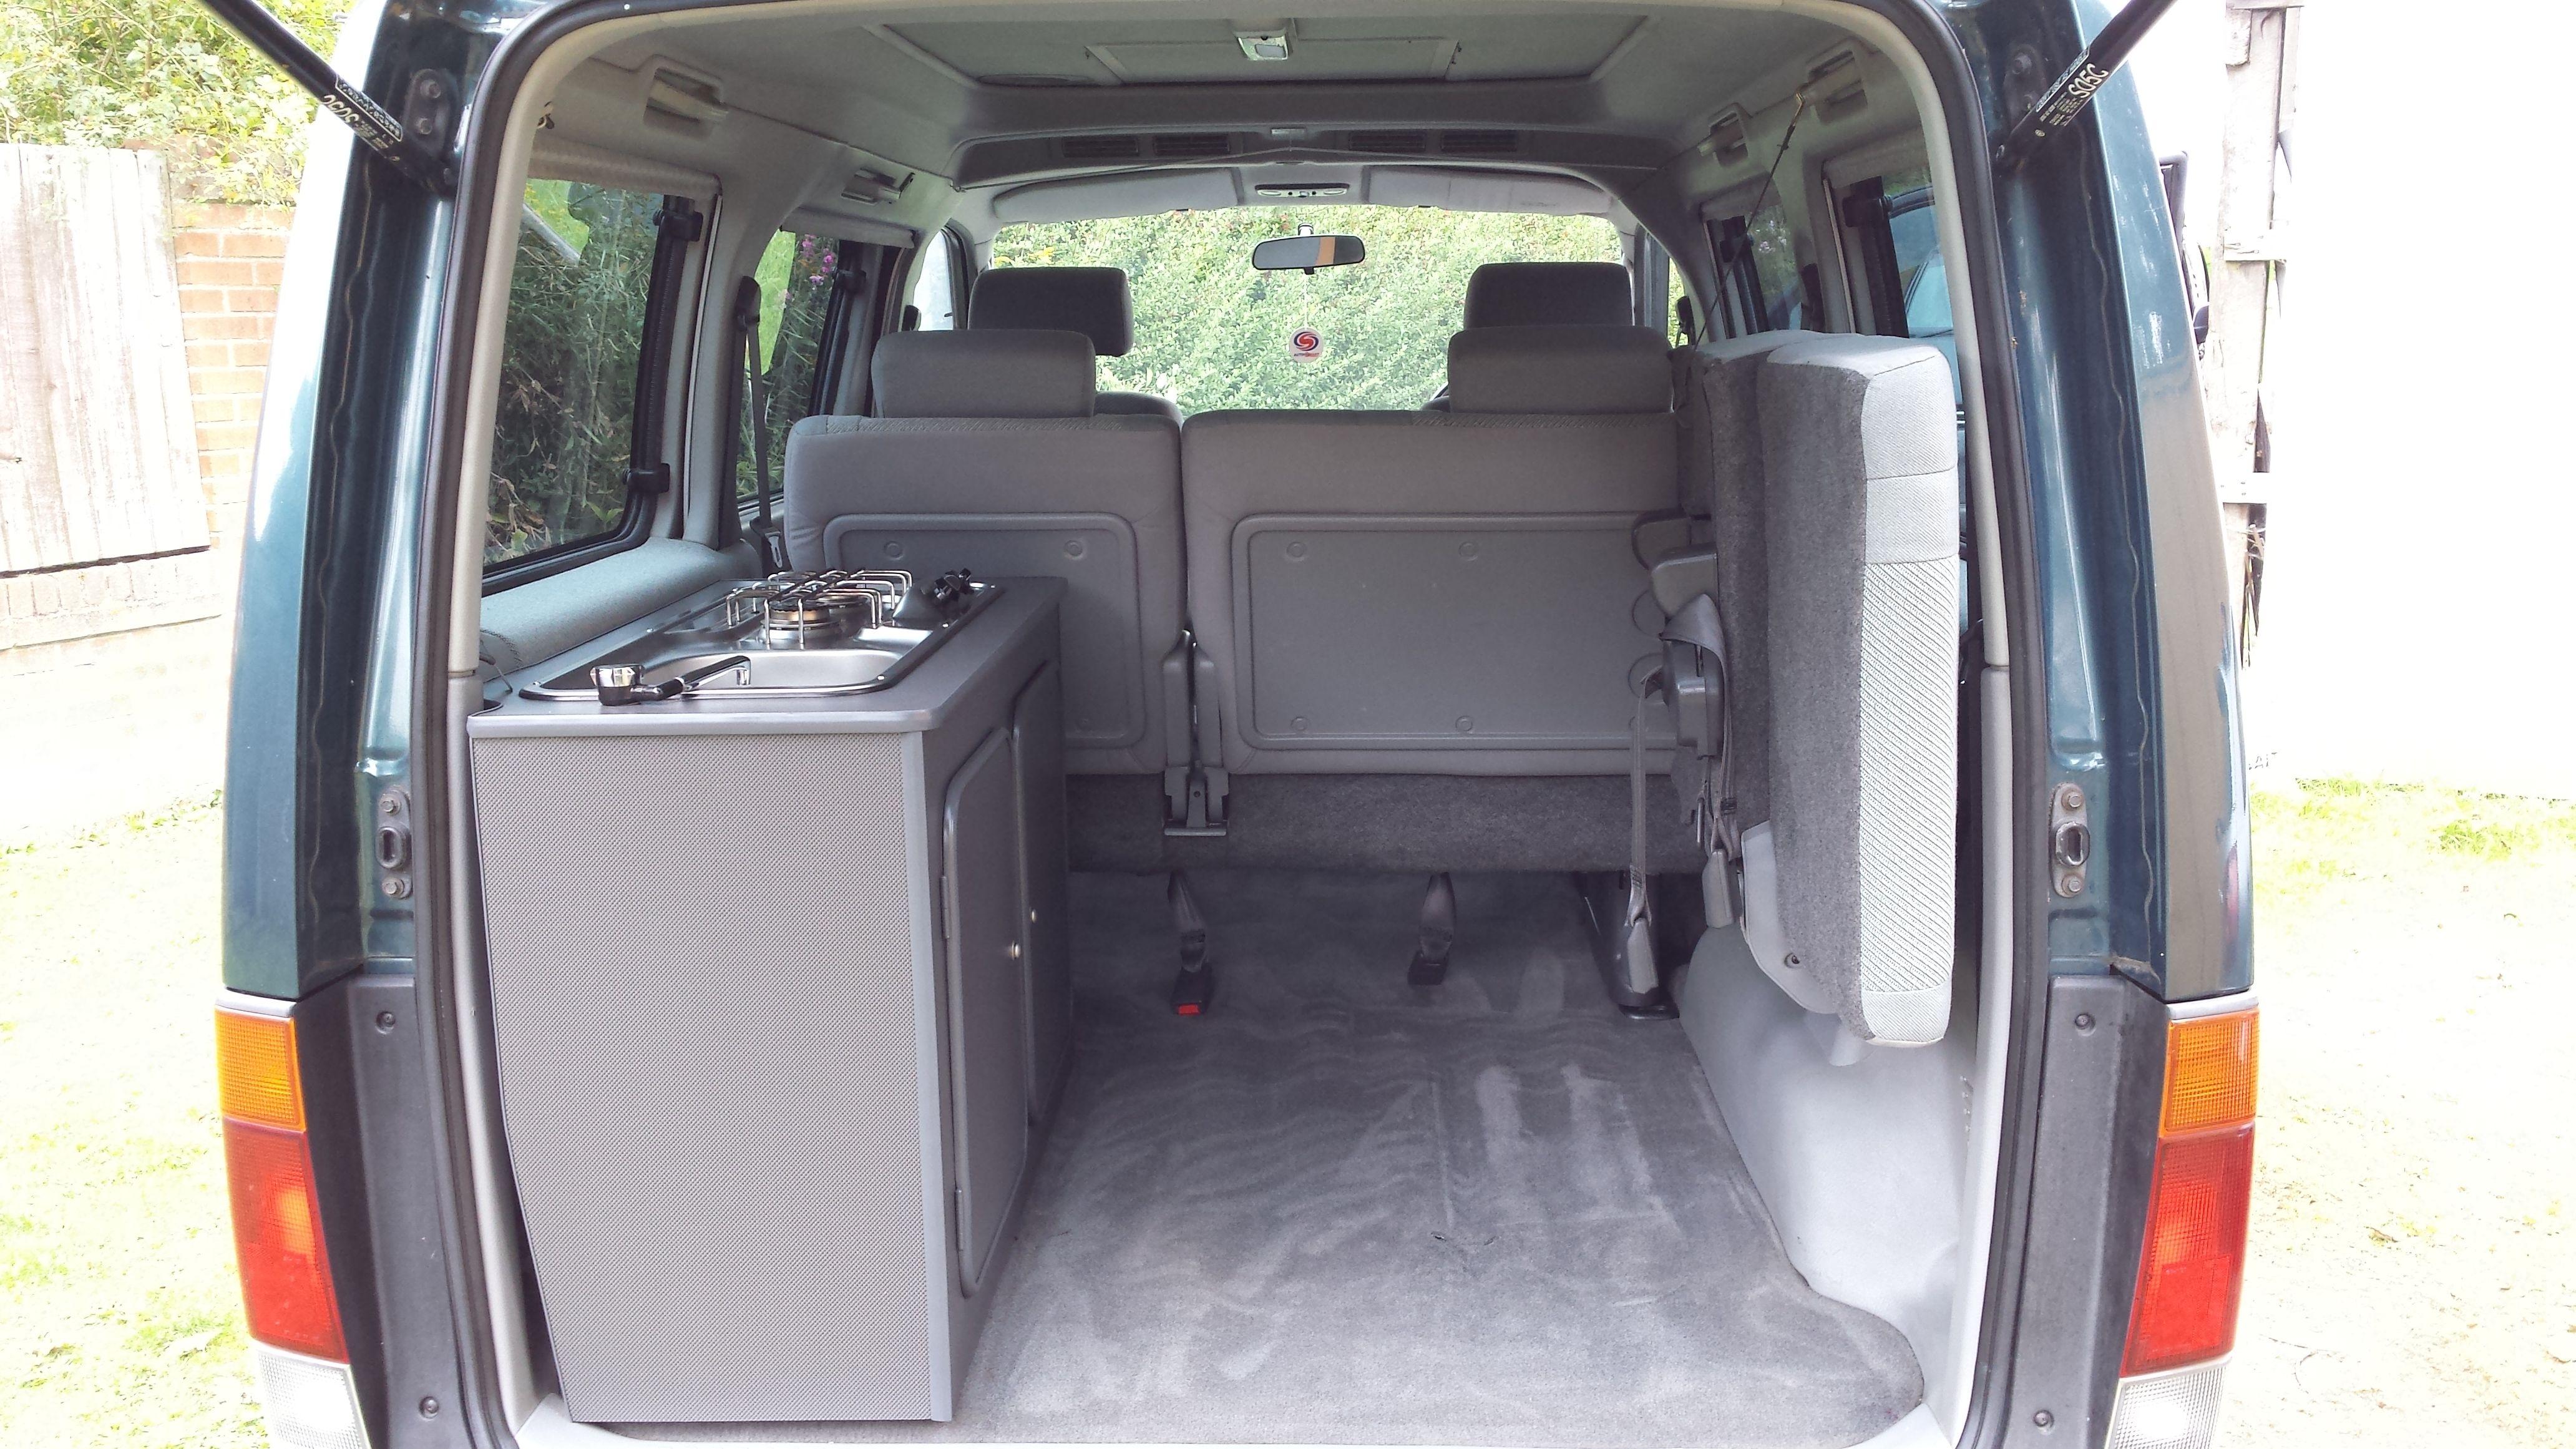 Bongo 6th Seat Folded Away Leaving Loads Of Storage Space Bongo Campervan Mazda Bongo Delica Van